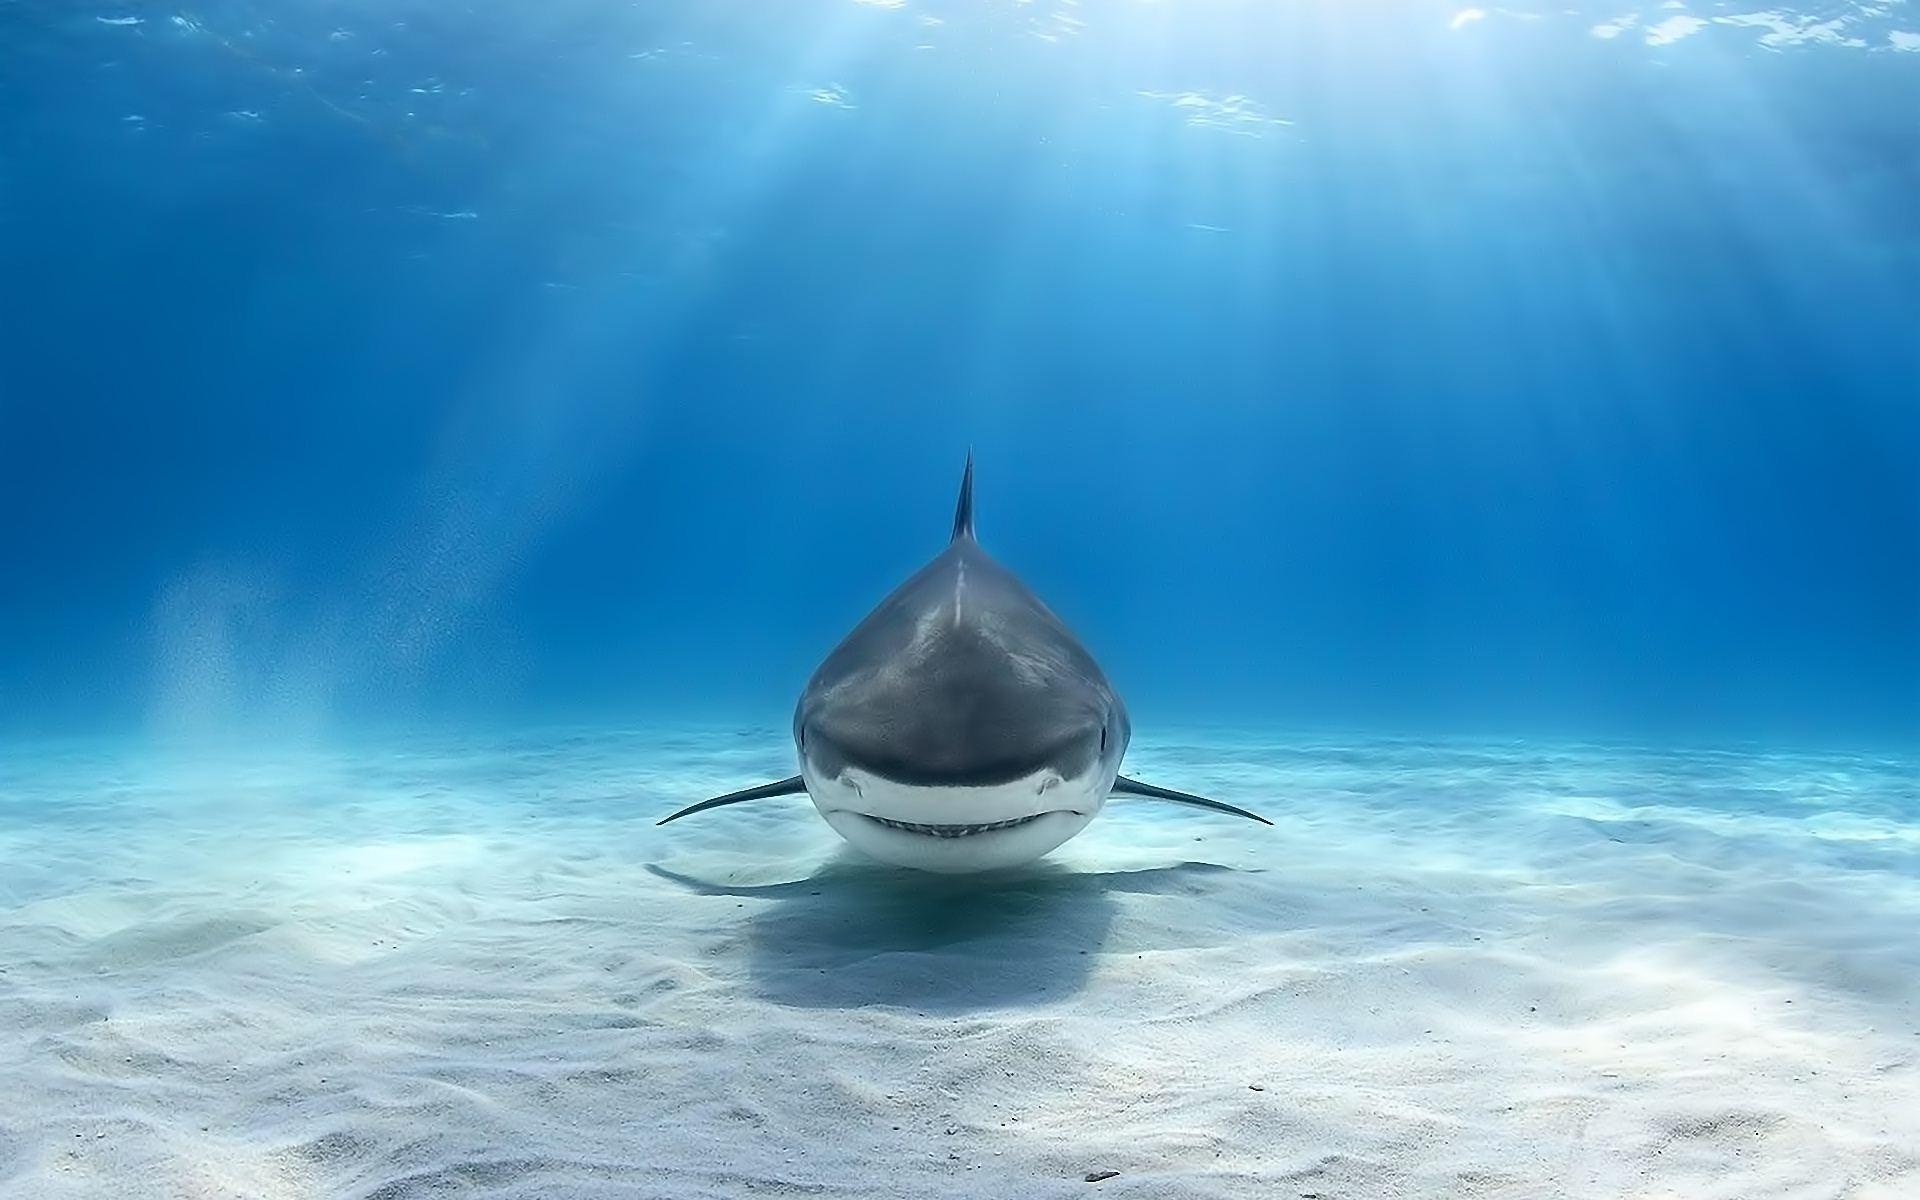 Wallpaper 1920x1200 Px Animals Great White Shark Shark